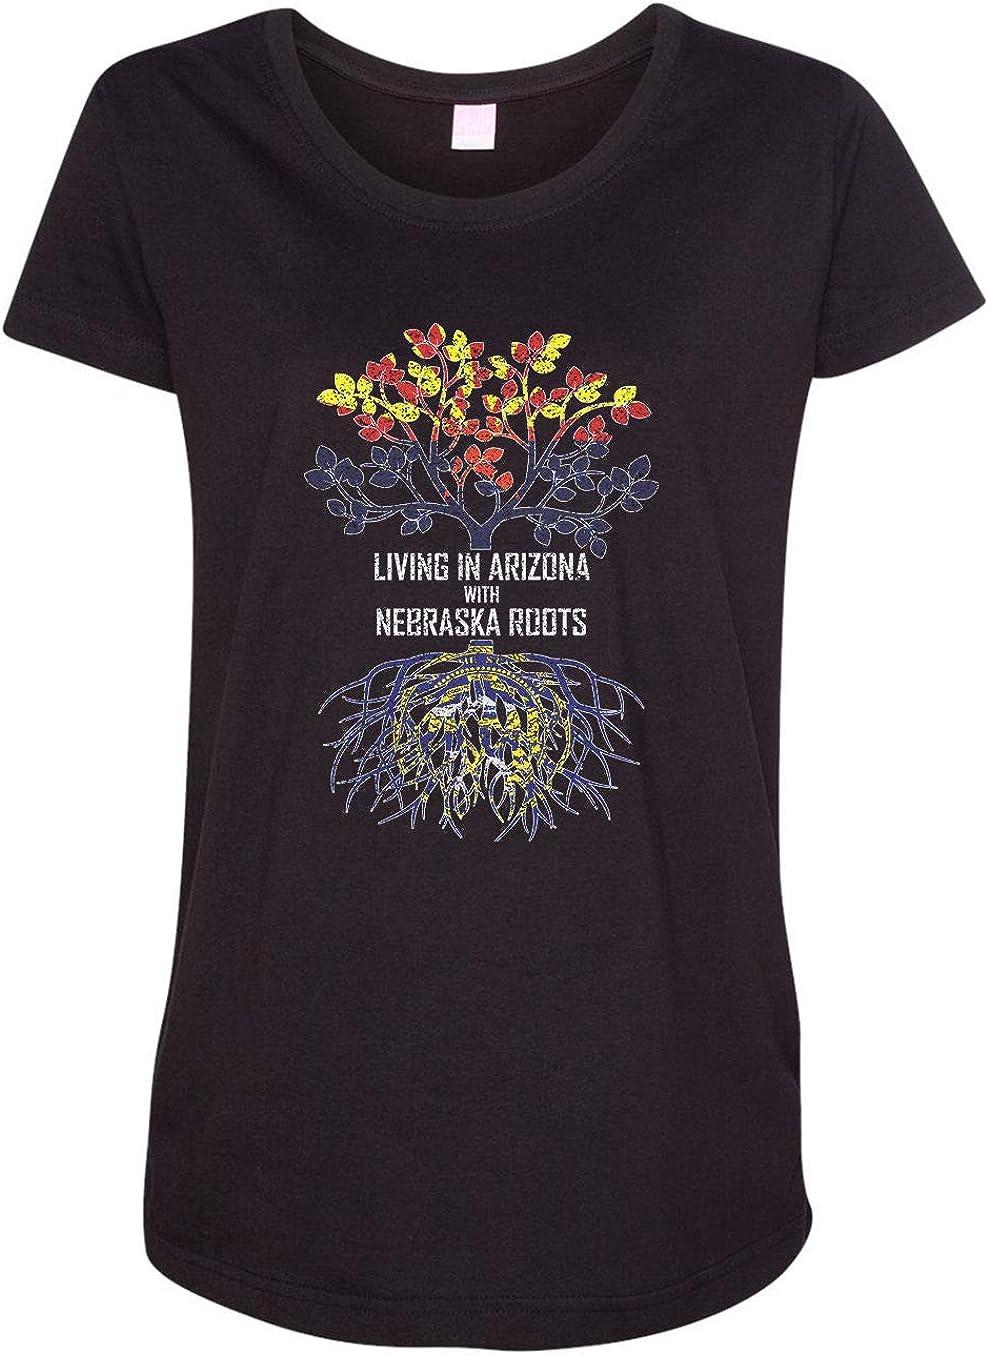 HARD EDGE DESIGN Women's Living in Arizona with Nebraska Roots T-Shirt